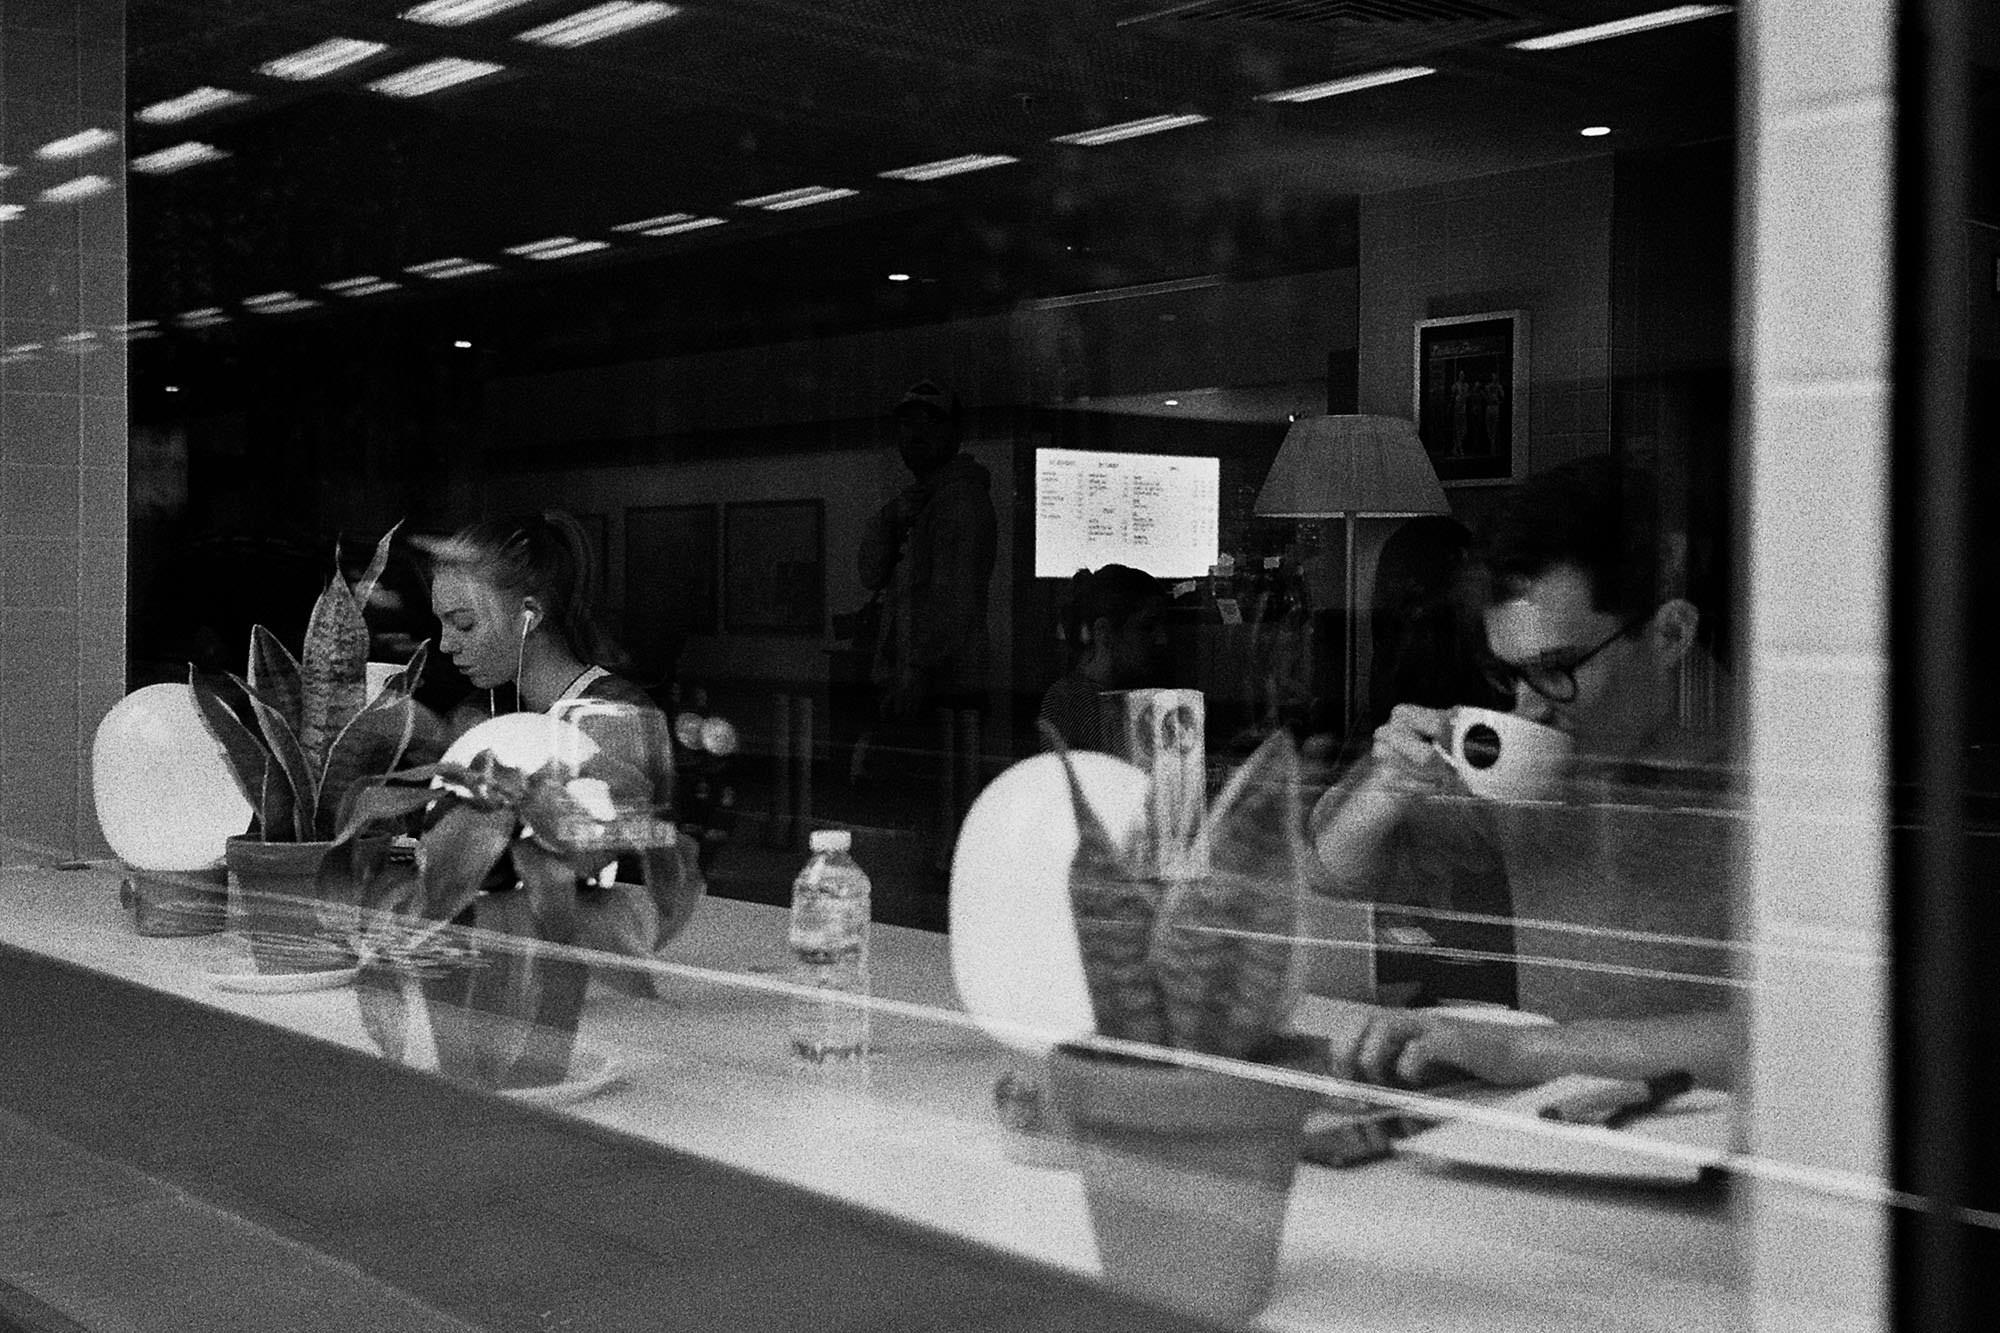 reflection-photo-coffee-shot-london-black-and-white